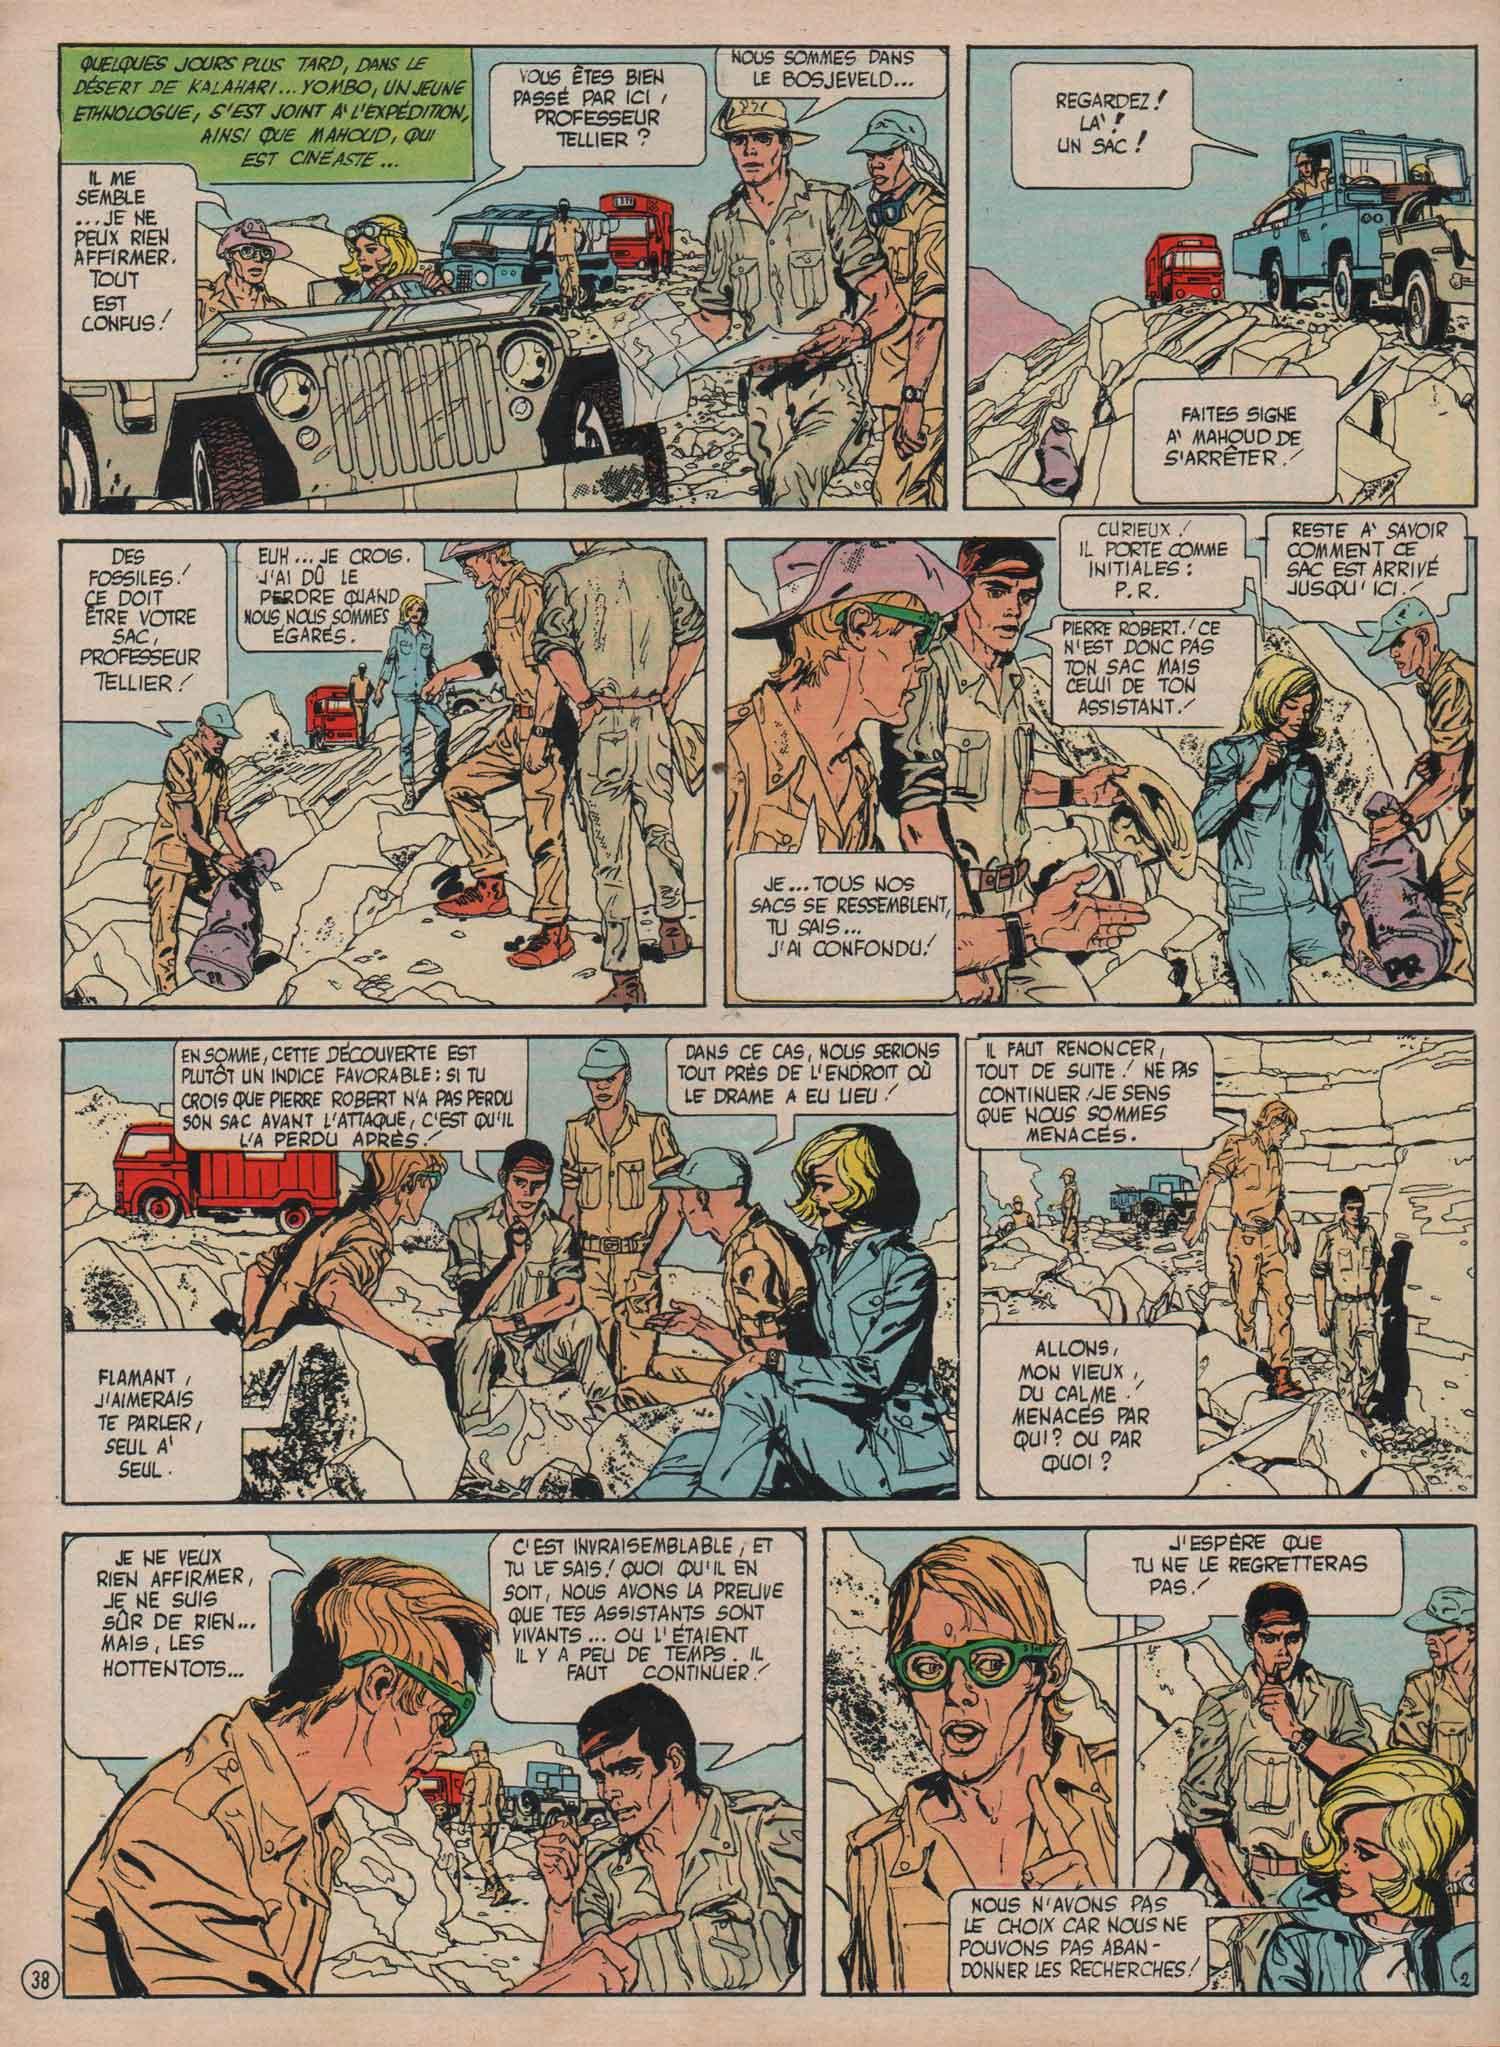 « Professeur Flamand » dans Le Journal de Mickey n° 1151 (07/07/1974).